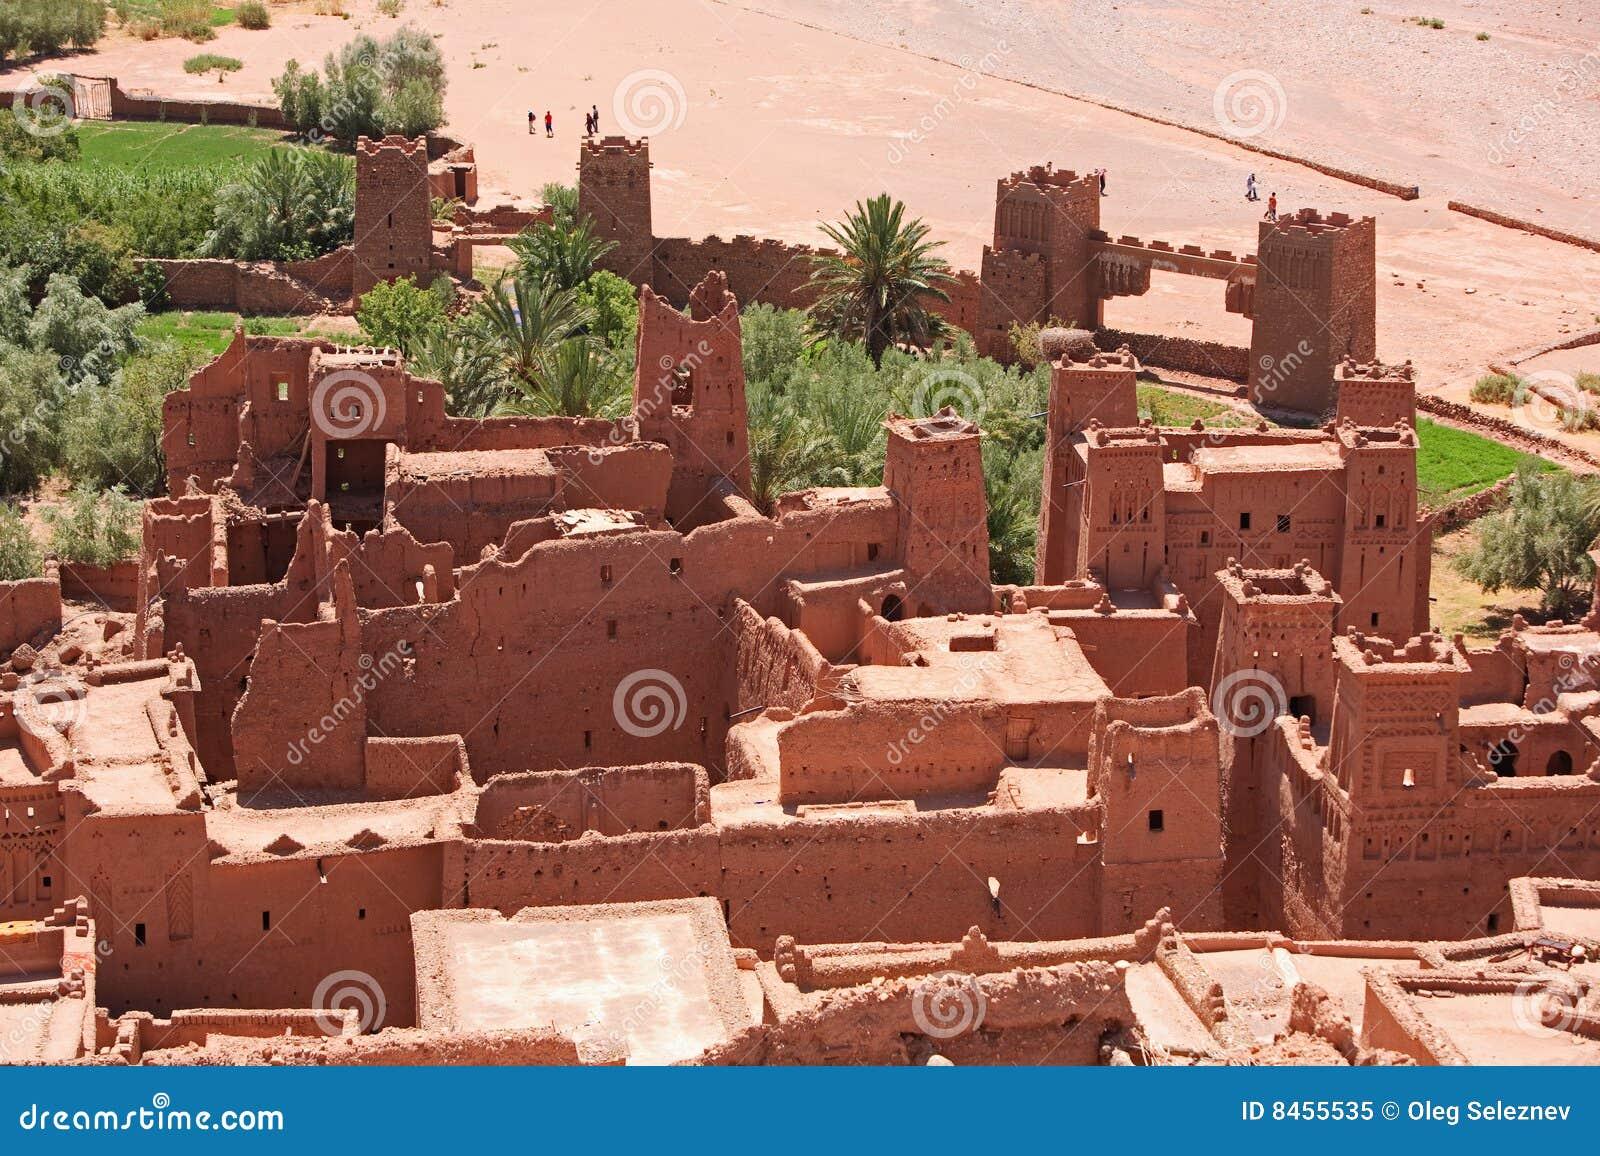 Ait-benhaddoucasbah morocco